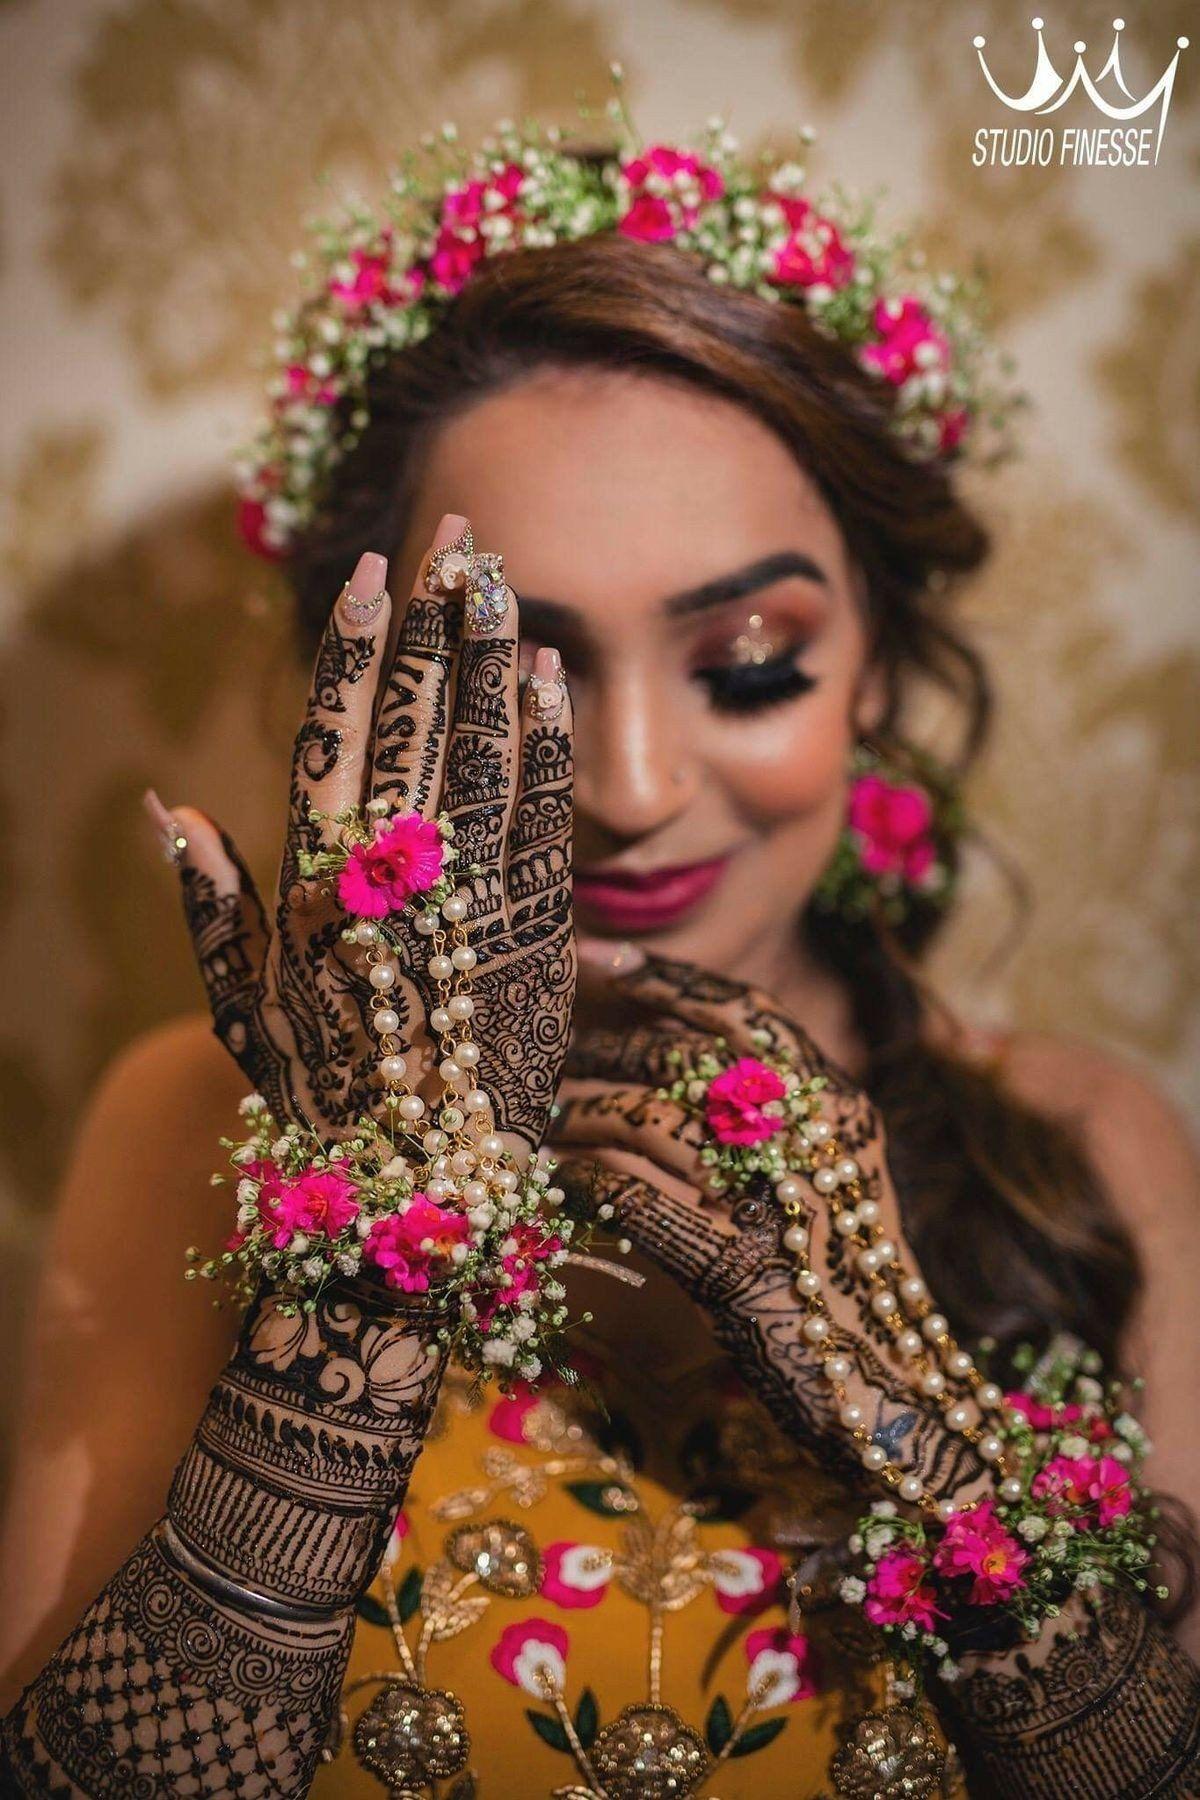 Florate Jewellary Bestlooks Wedding Flower Jewelry Indian Wedding Photography Poses Flower Jewellery For Mehndi